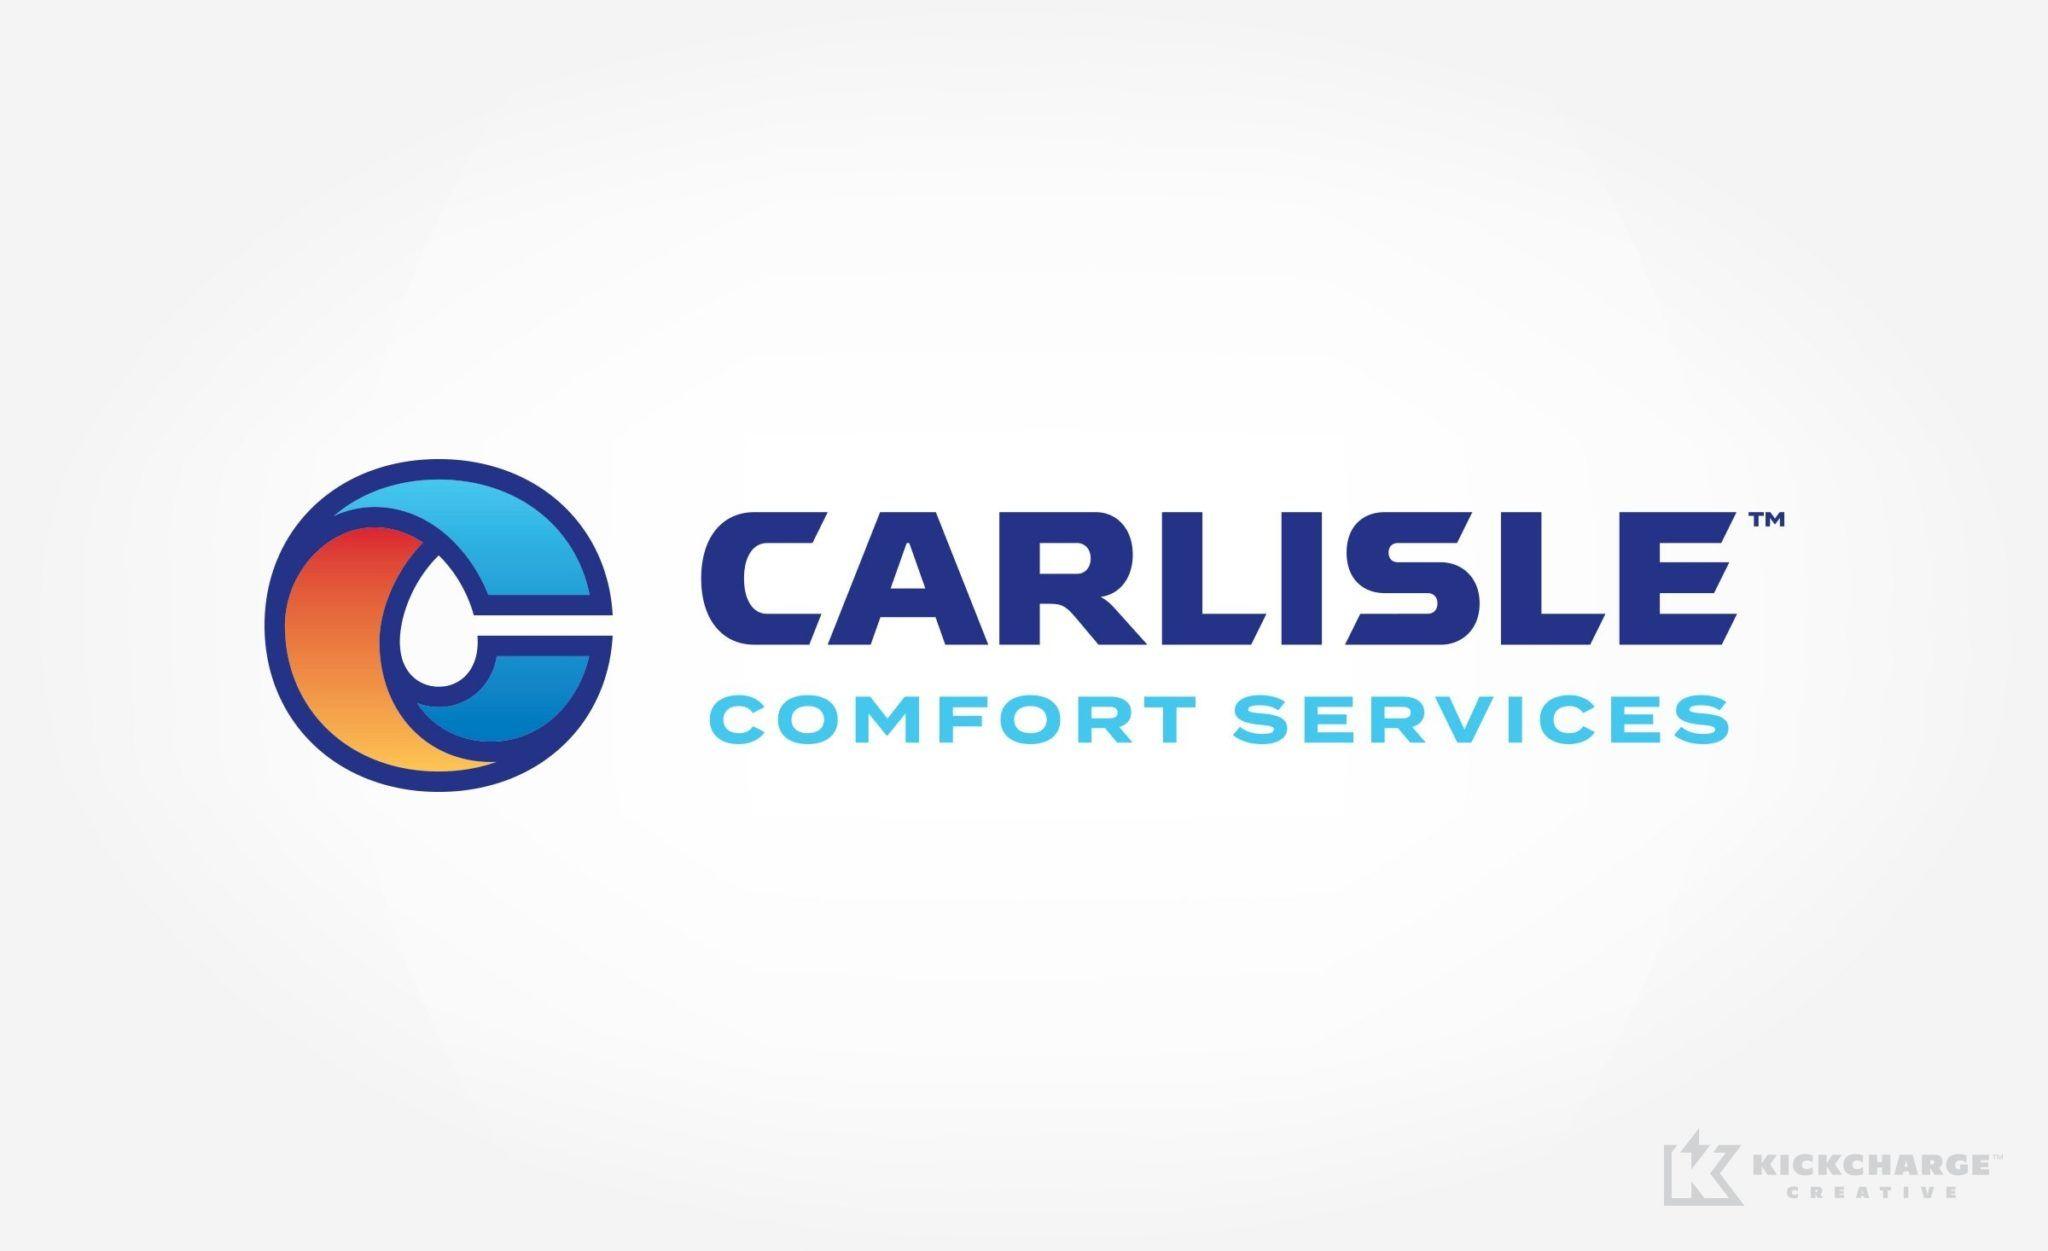 Carlisle Comfort Services Kickcharge Creative Plumbing Logo Plumbing Logo Design Hvac Brands